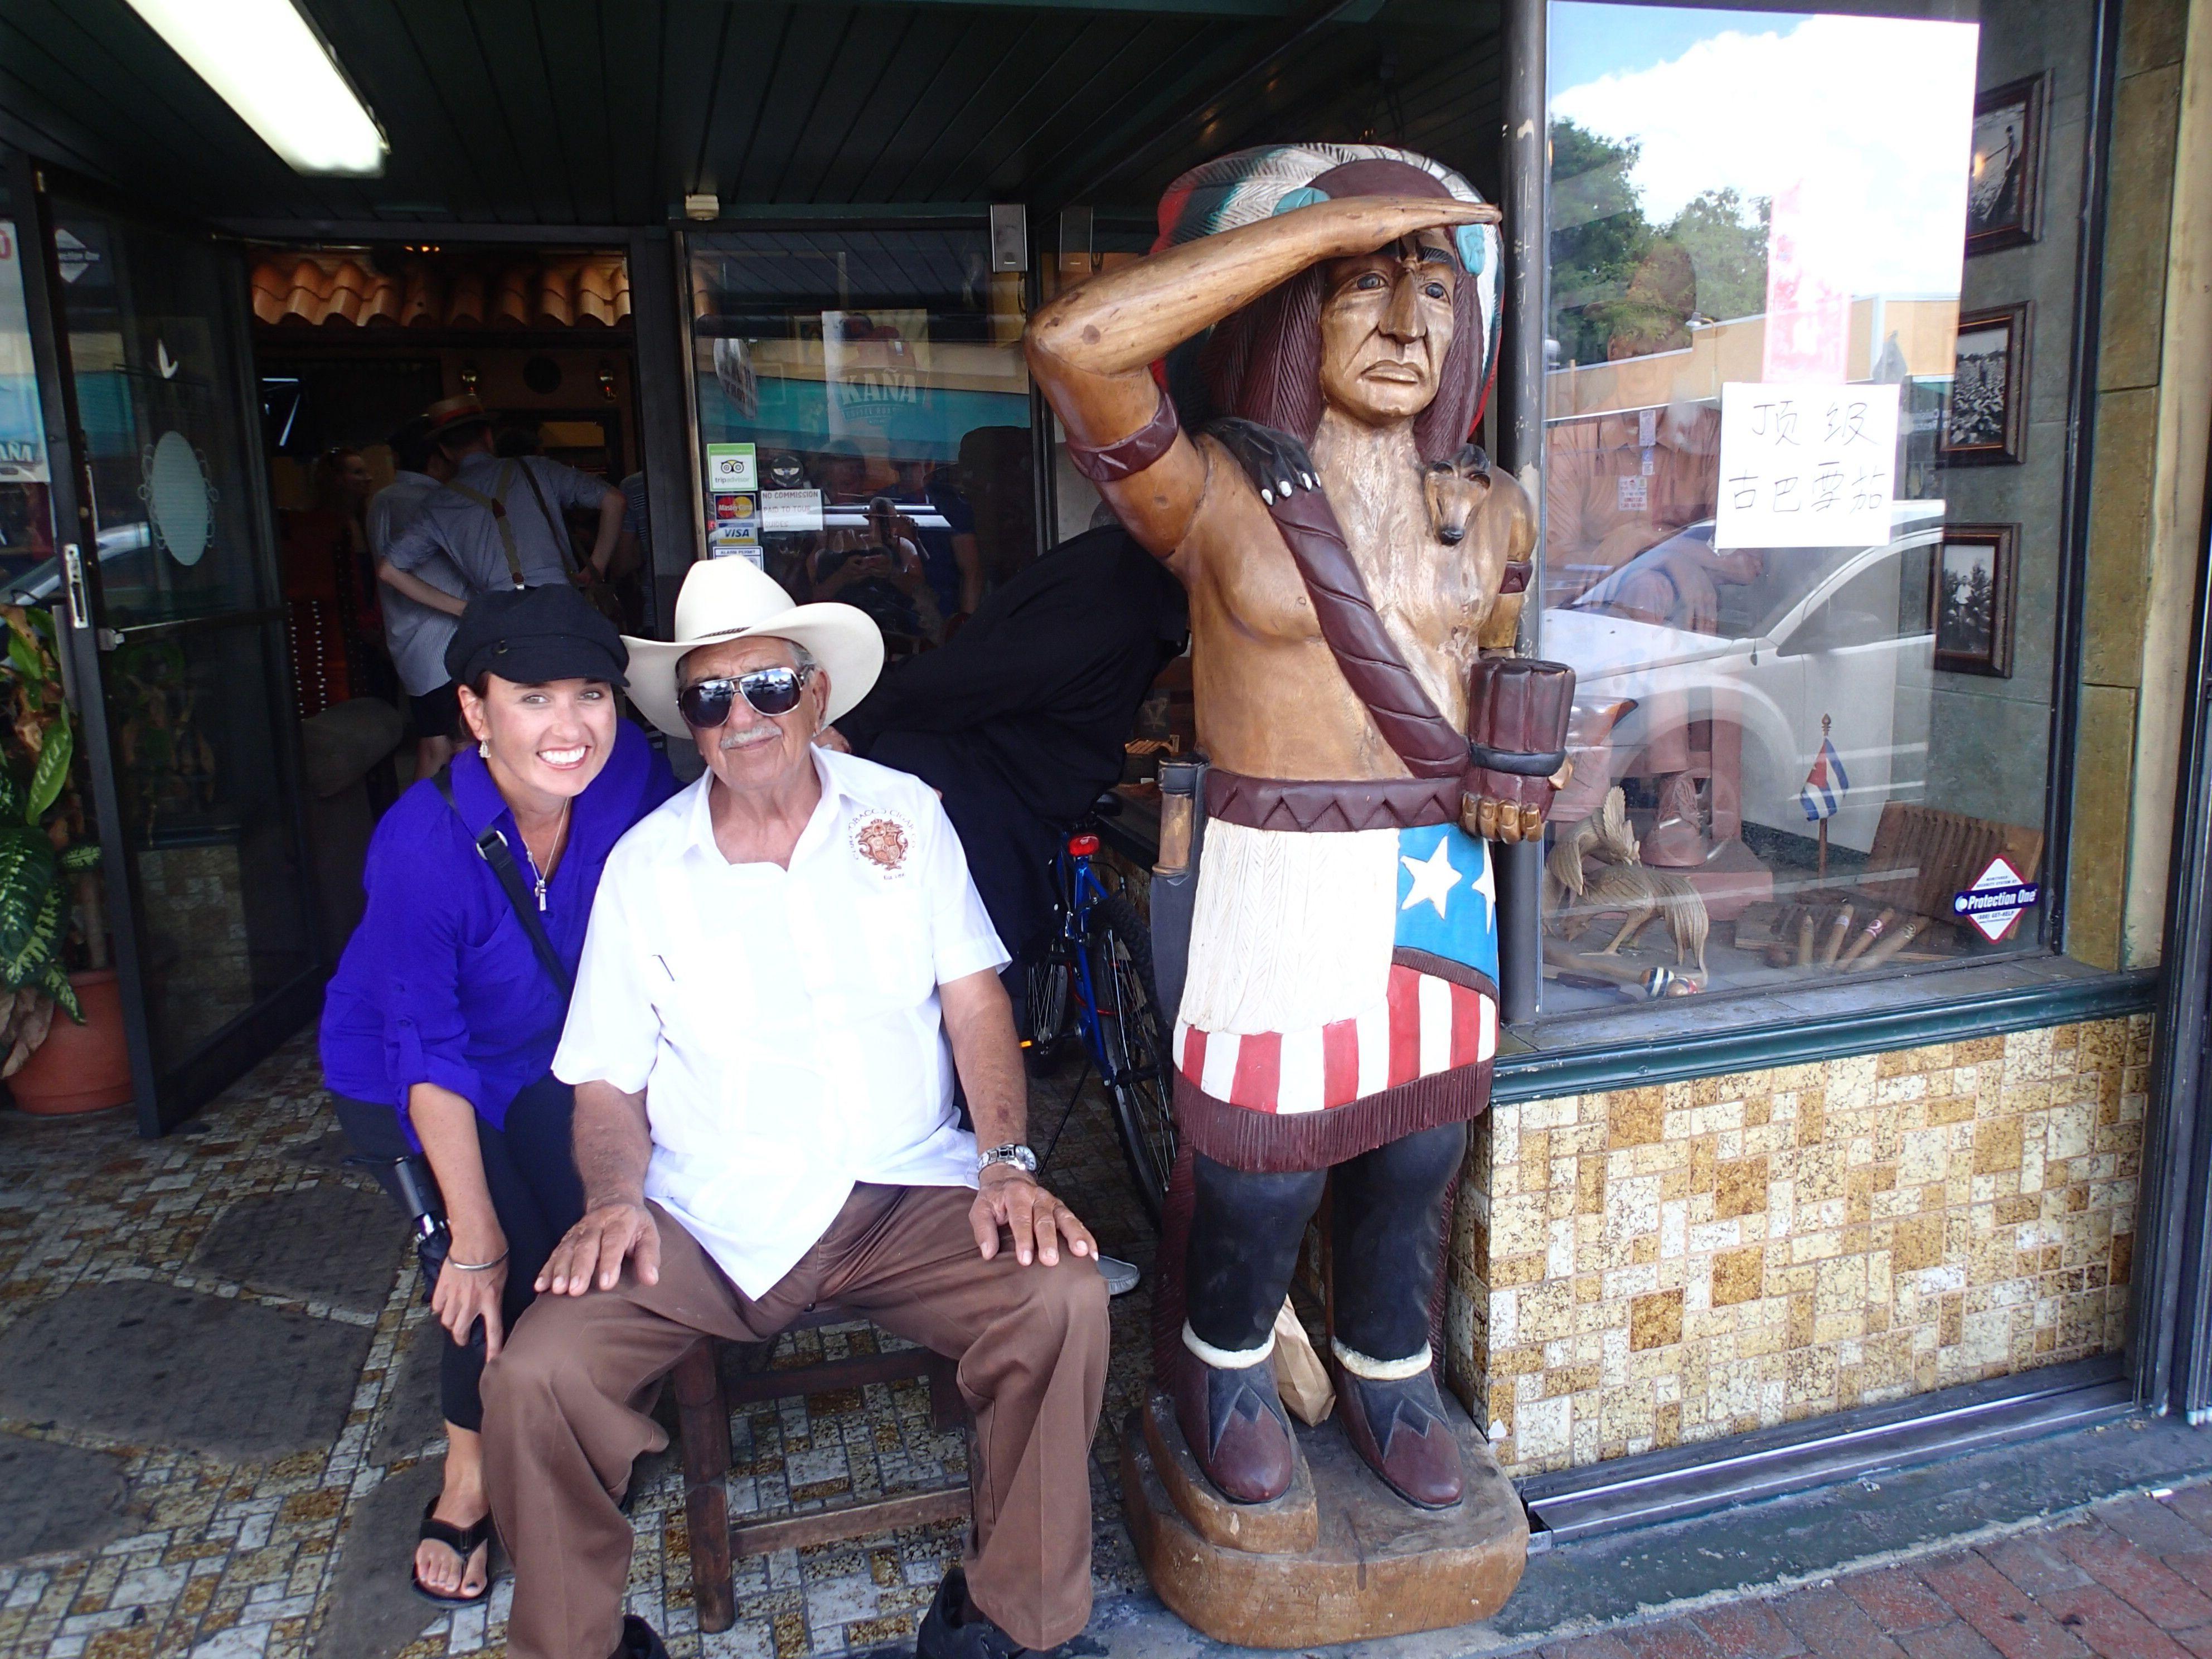 Cuban_Cigars_in_Little_Havana_Miami